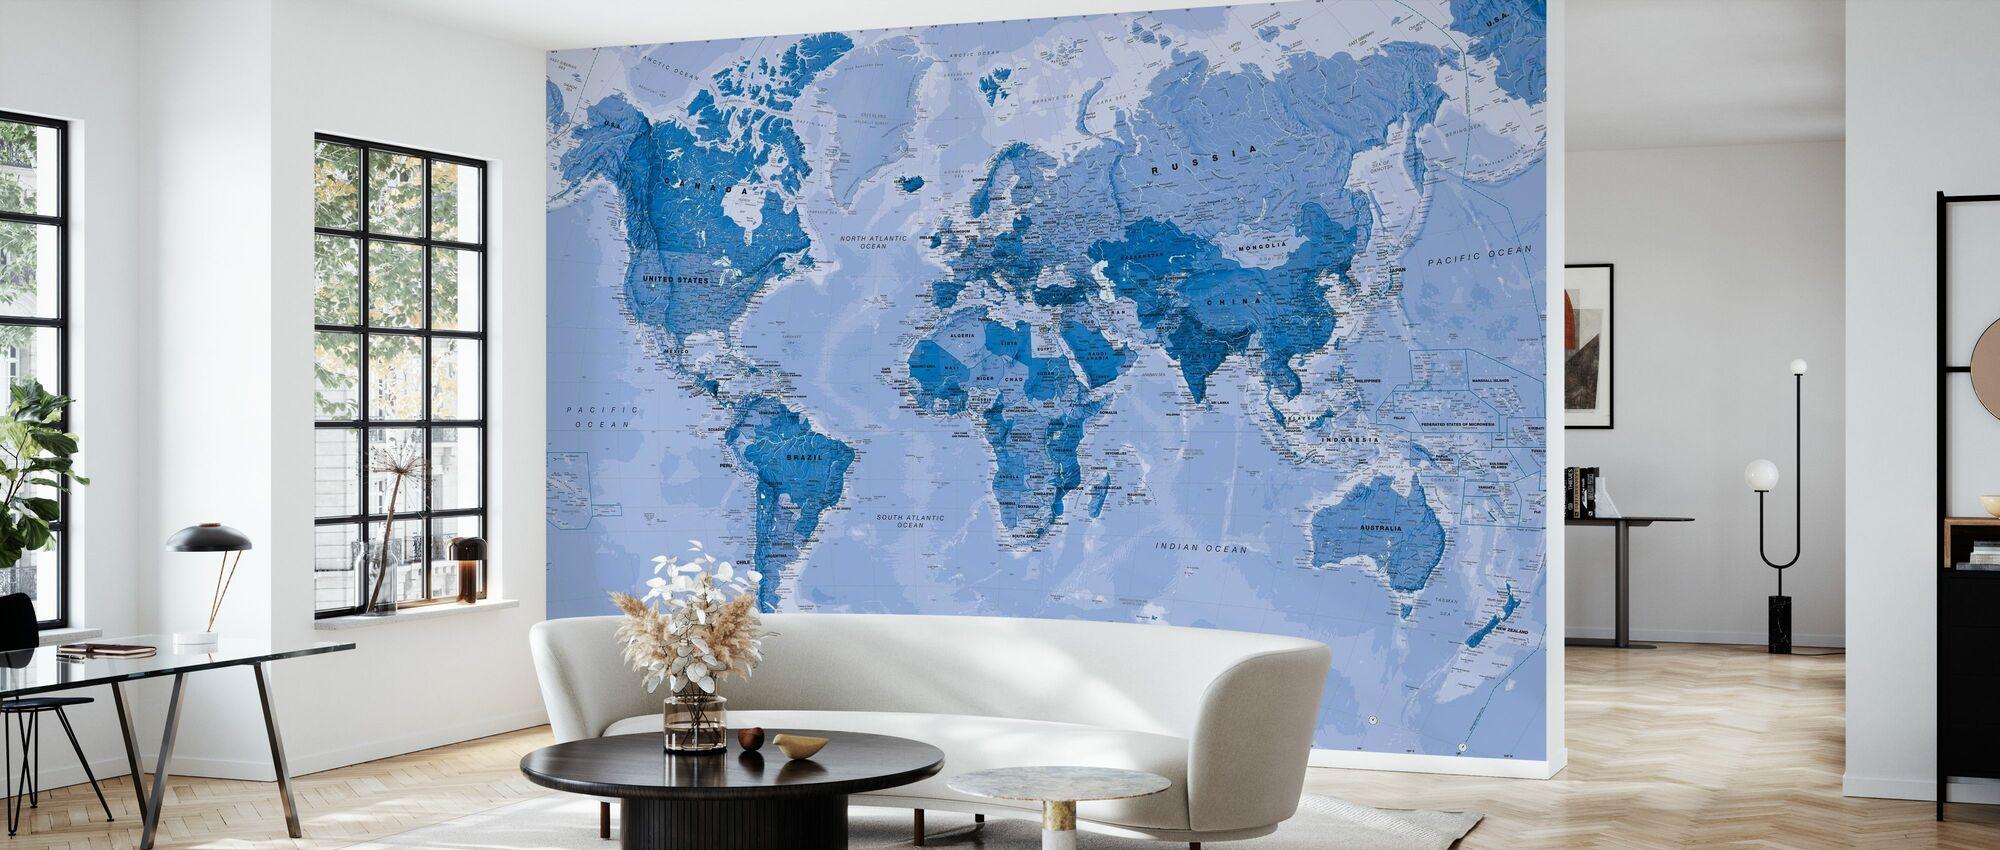 World Map Blue - Wallpaper - Living Room